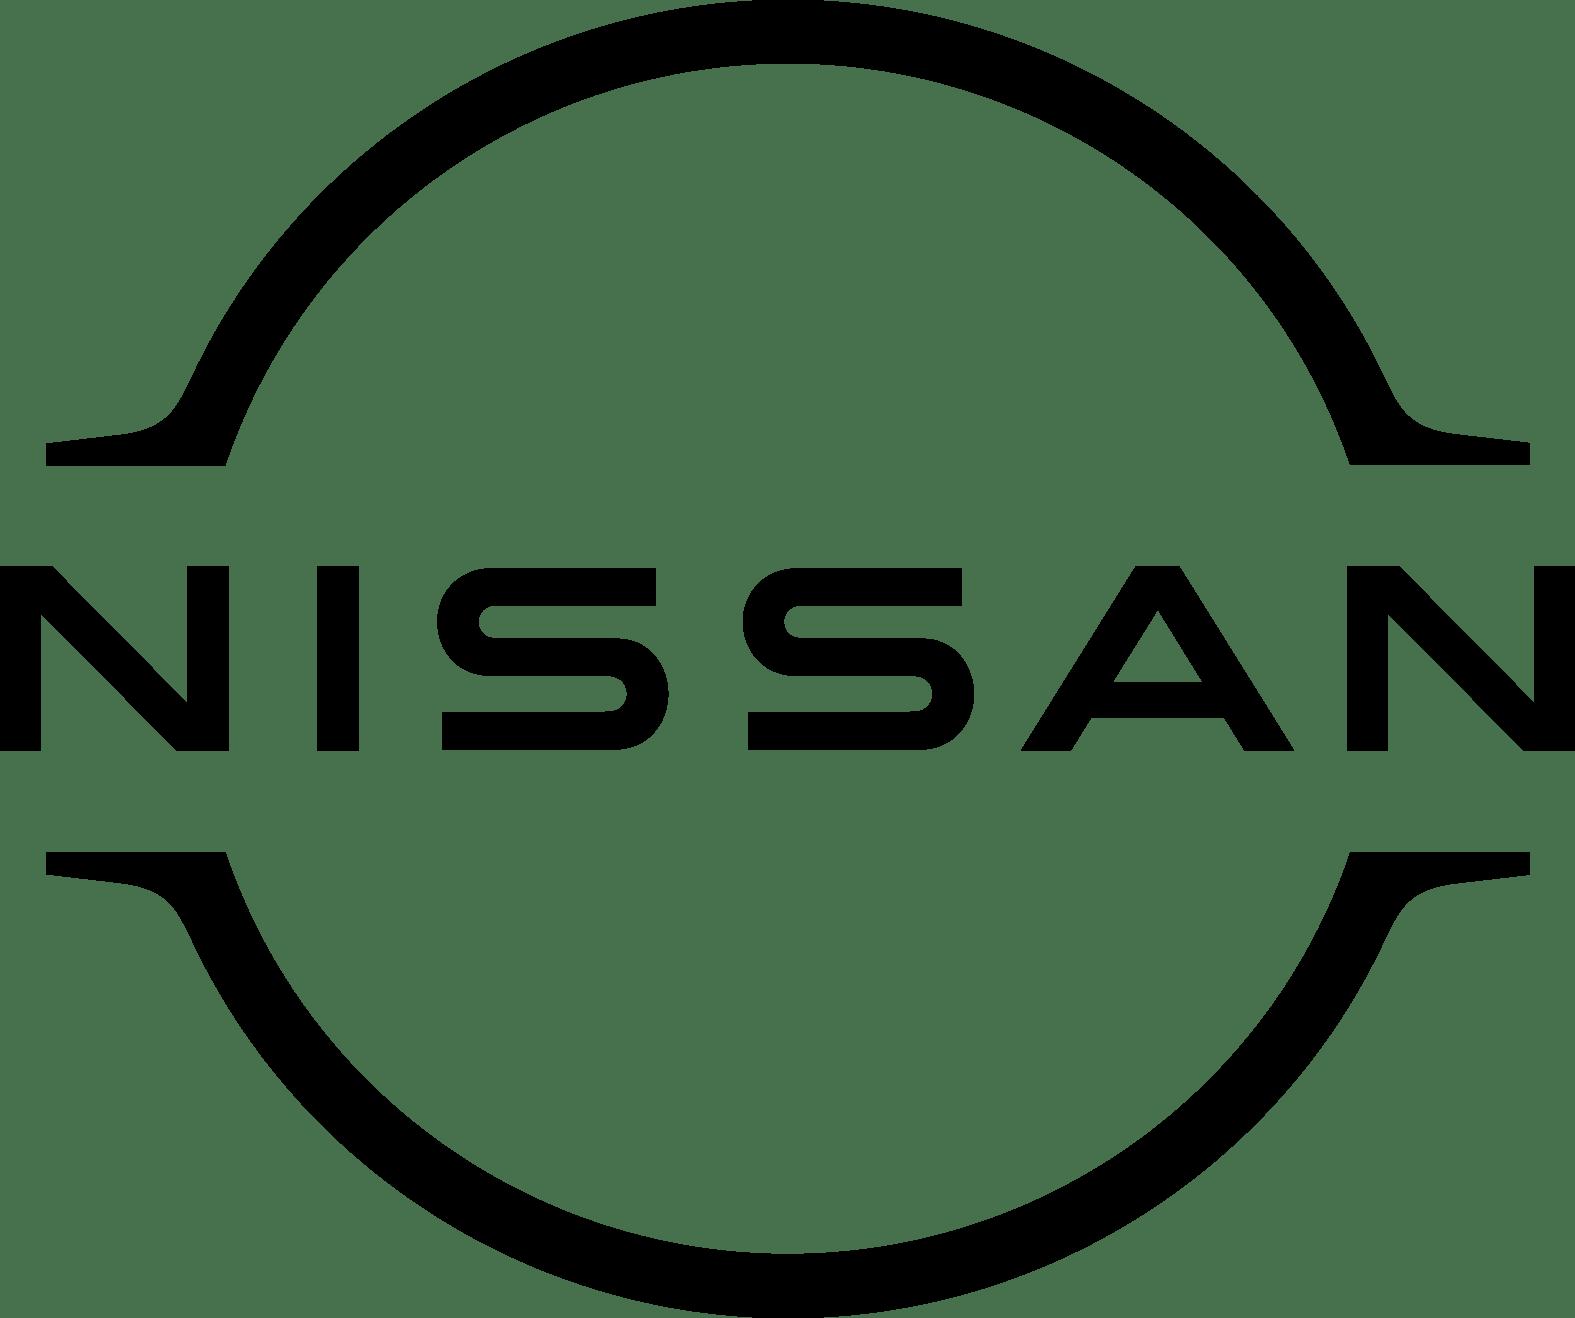 Nissan Merchandise Store